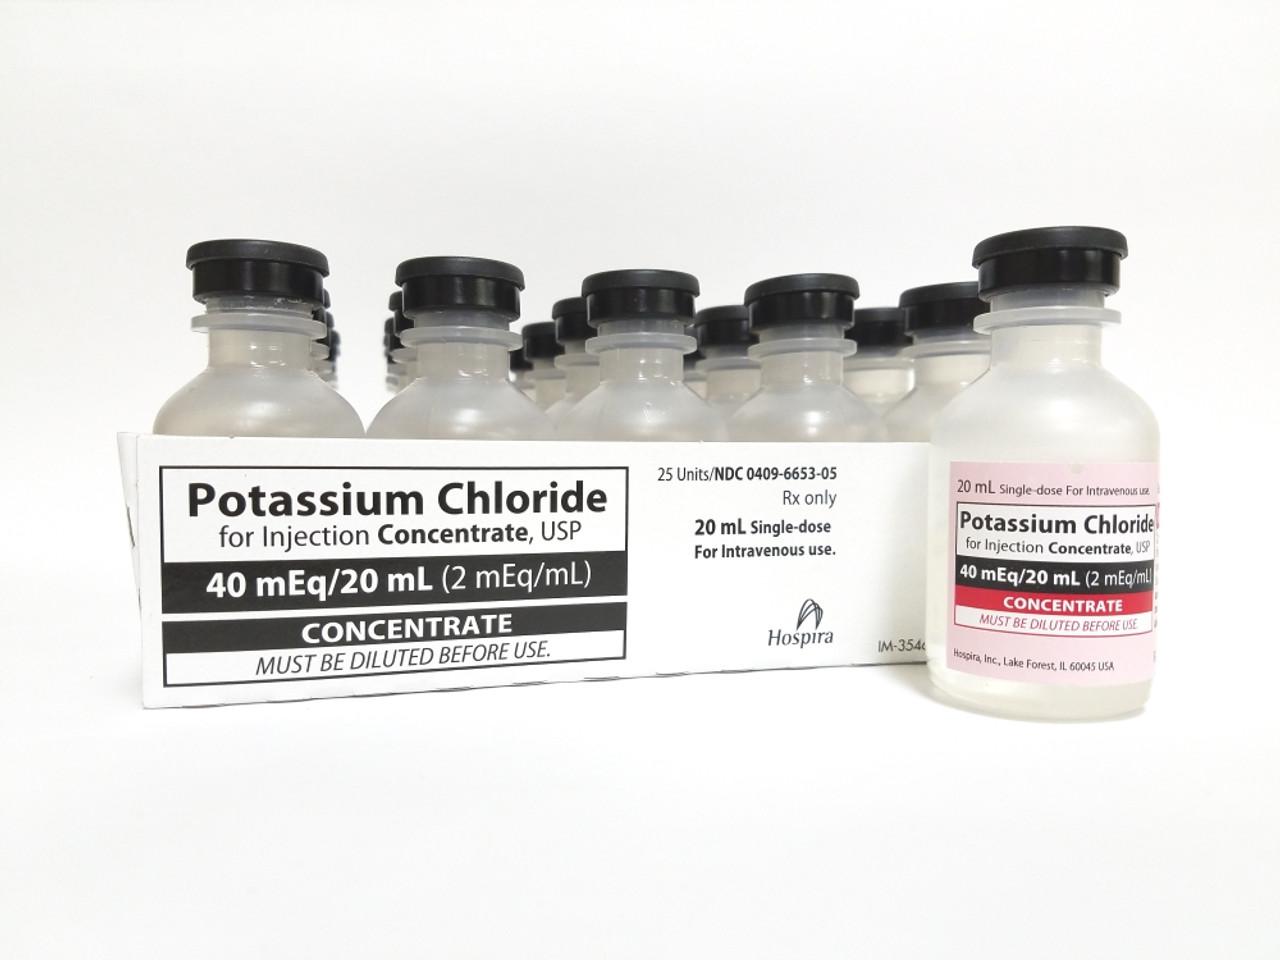 POTASSIUM CHLORIDE, 2 mEq/mL * 20 mL (EACH) - The Torrance